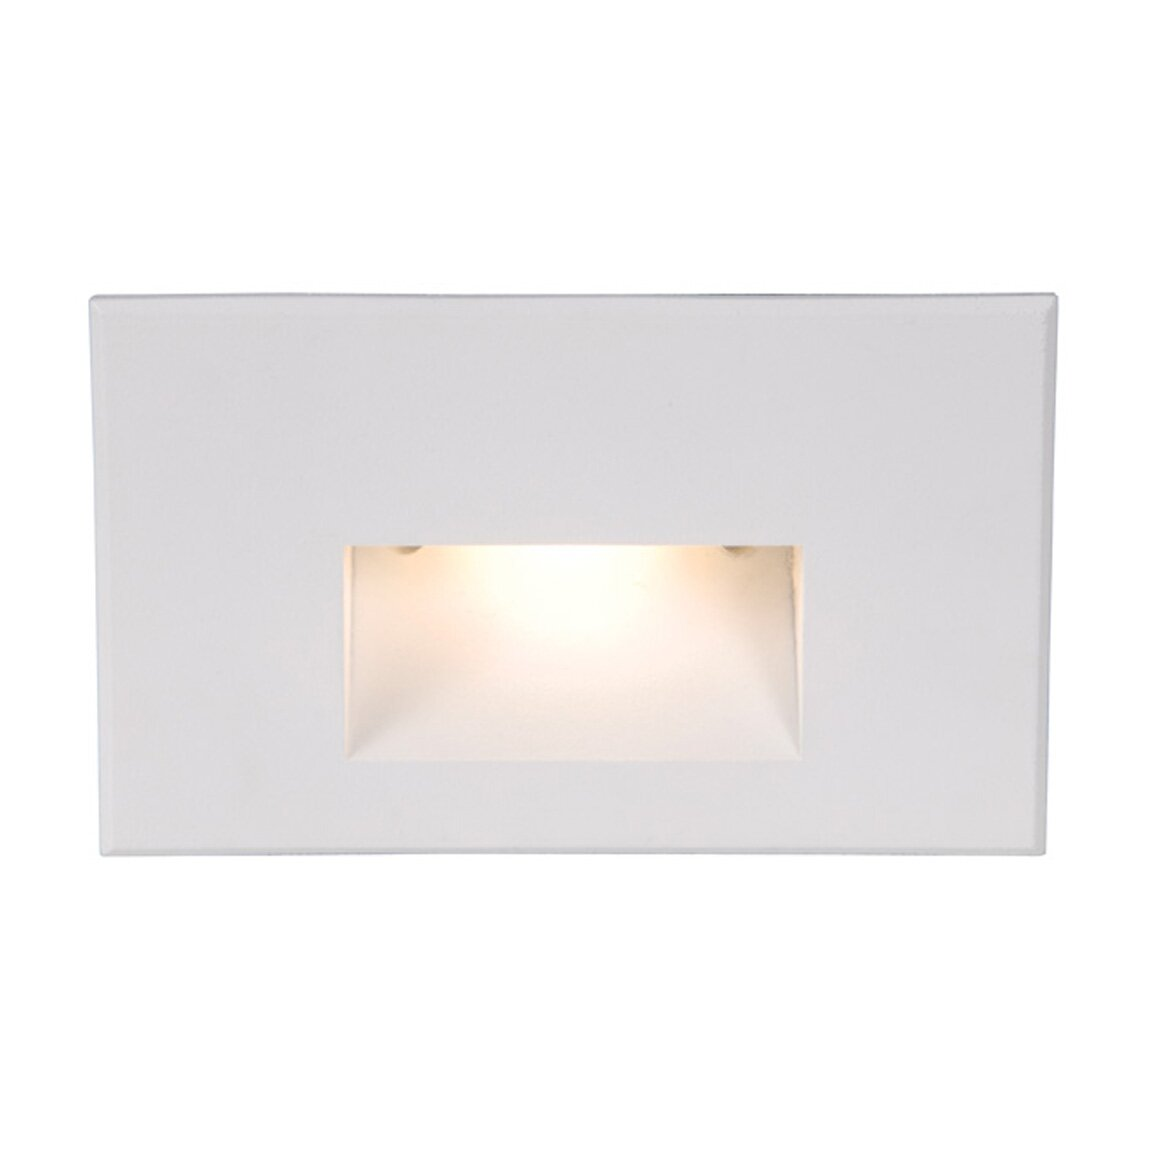 Wac lighting led - Wac Lighting 1 Light Led Step Light